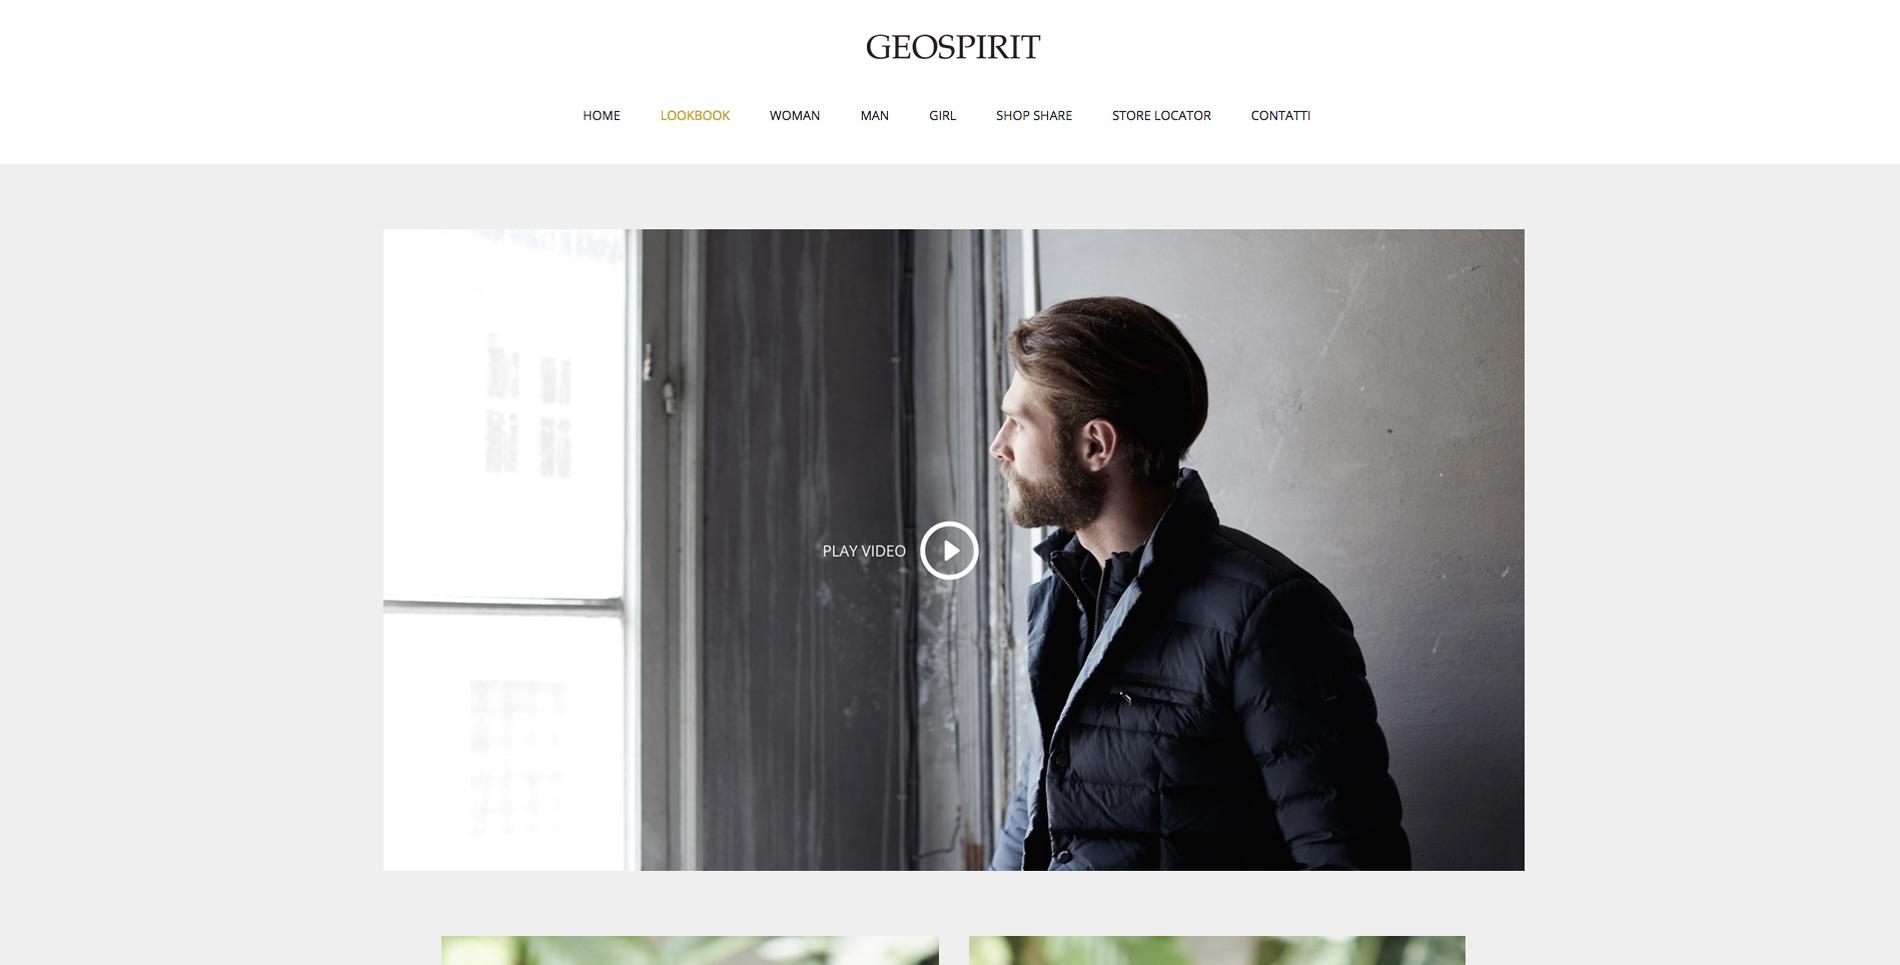 geospirit sito web lookbook